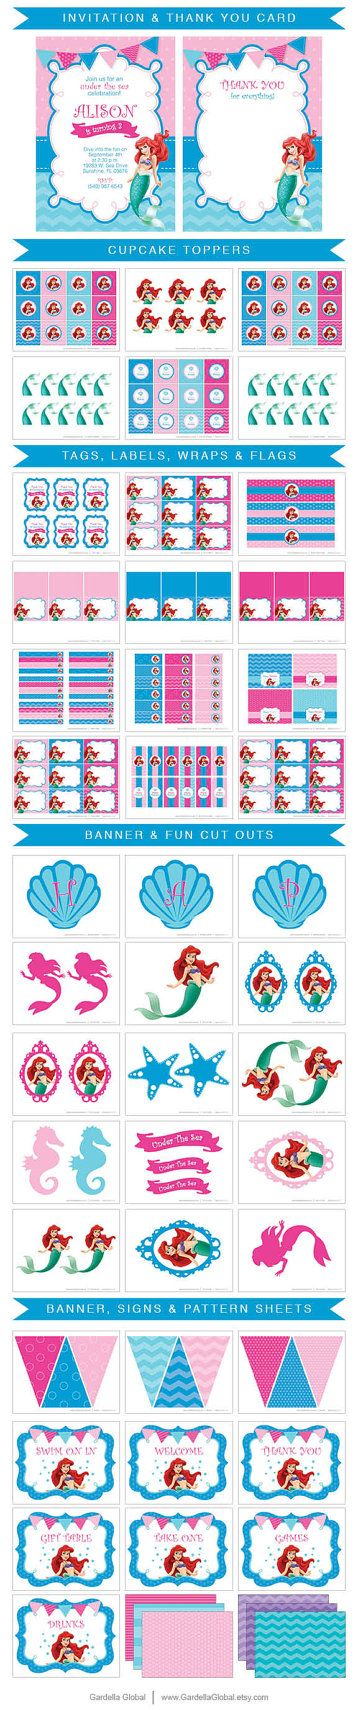 Little Mermaid Invitation Little Mermaid invite por GardellaGlobal